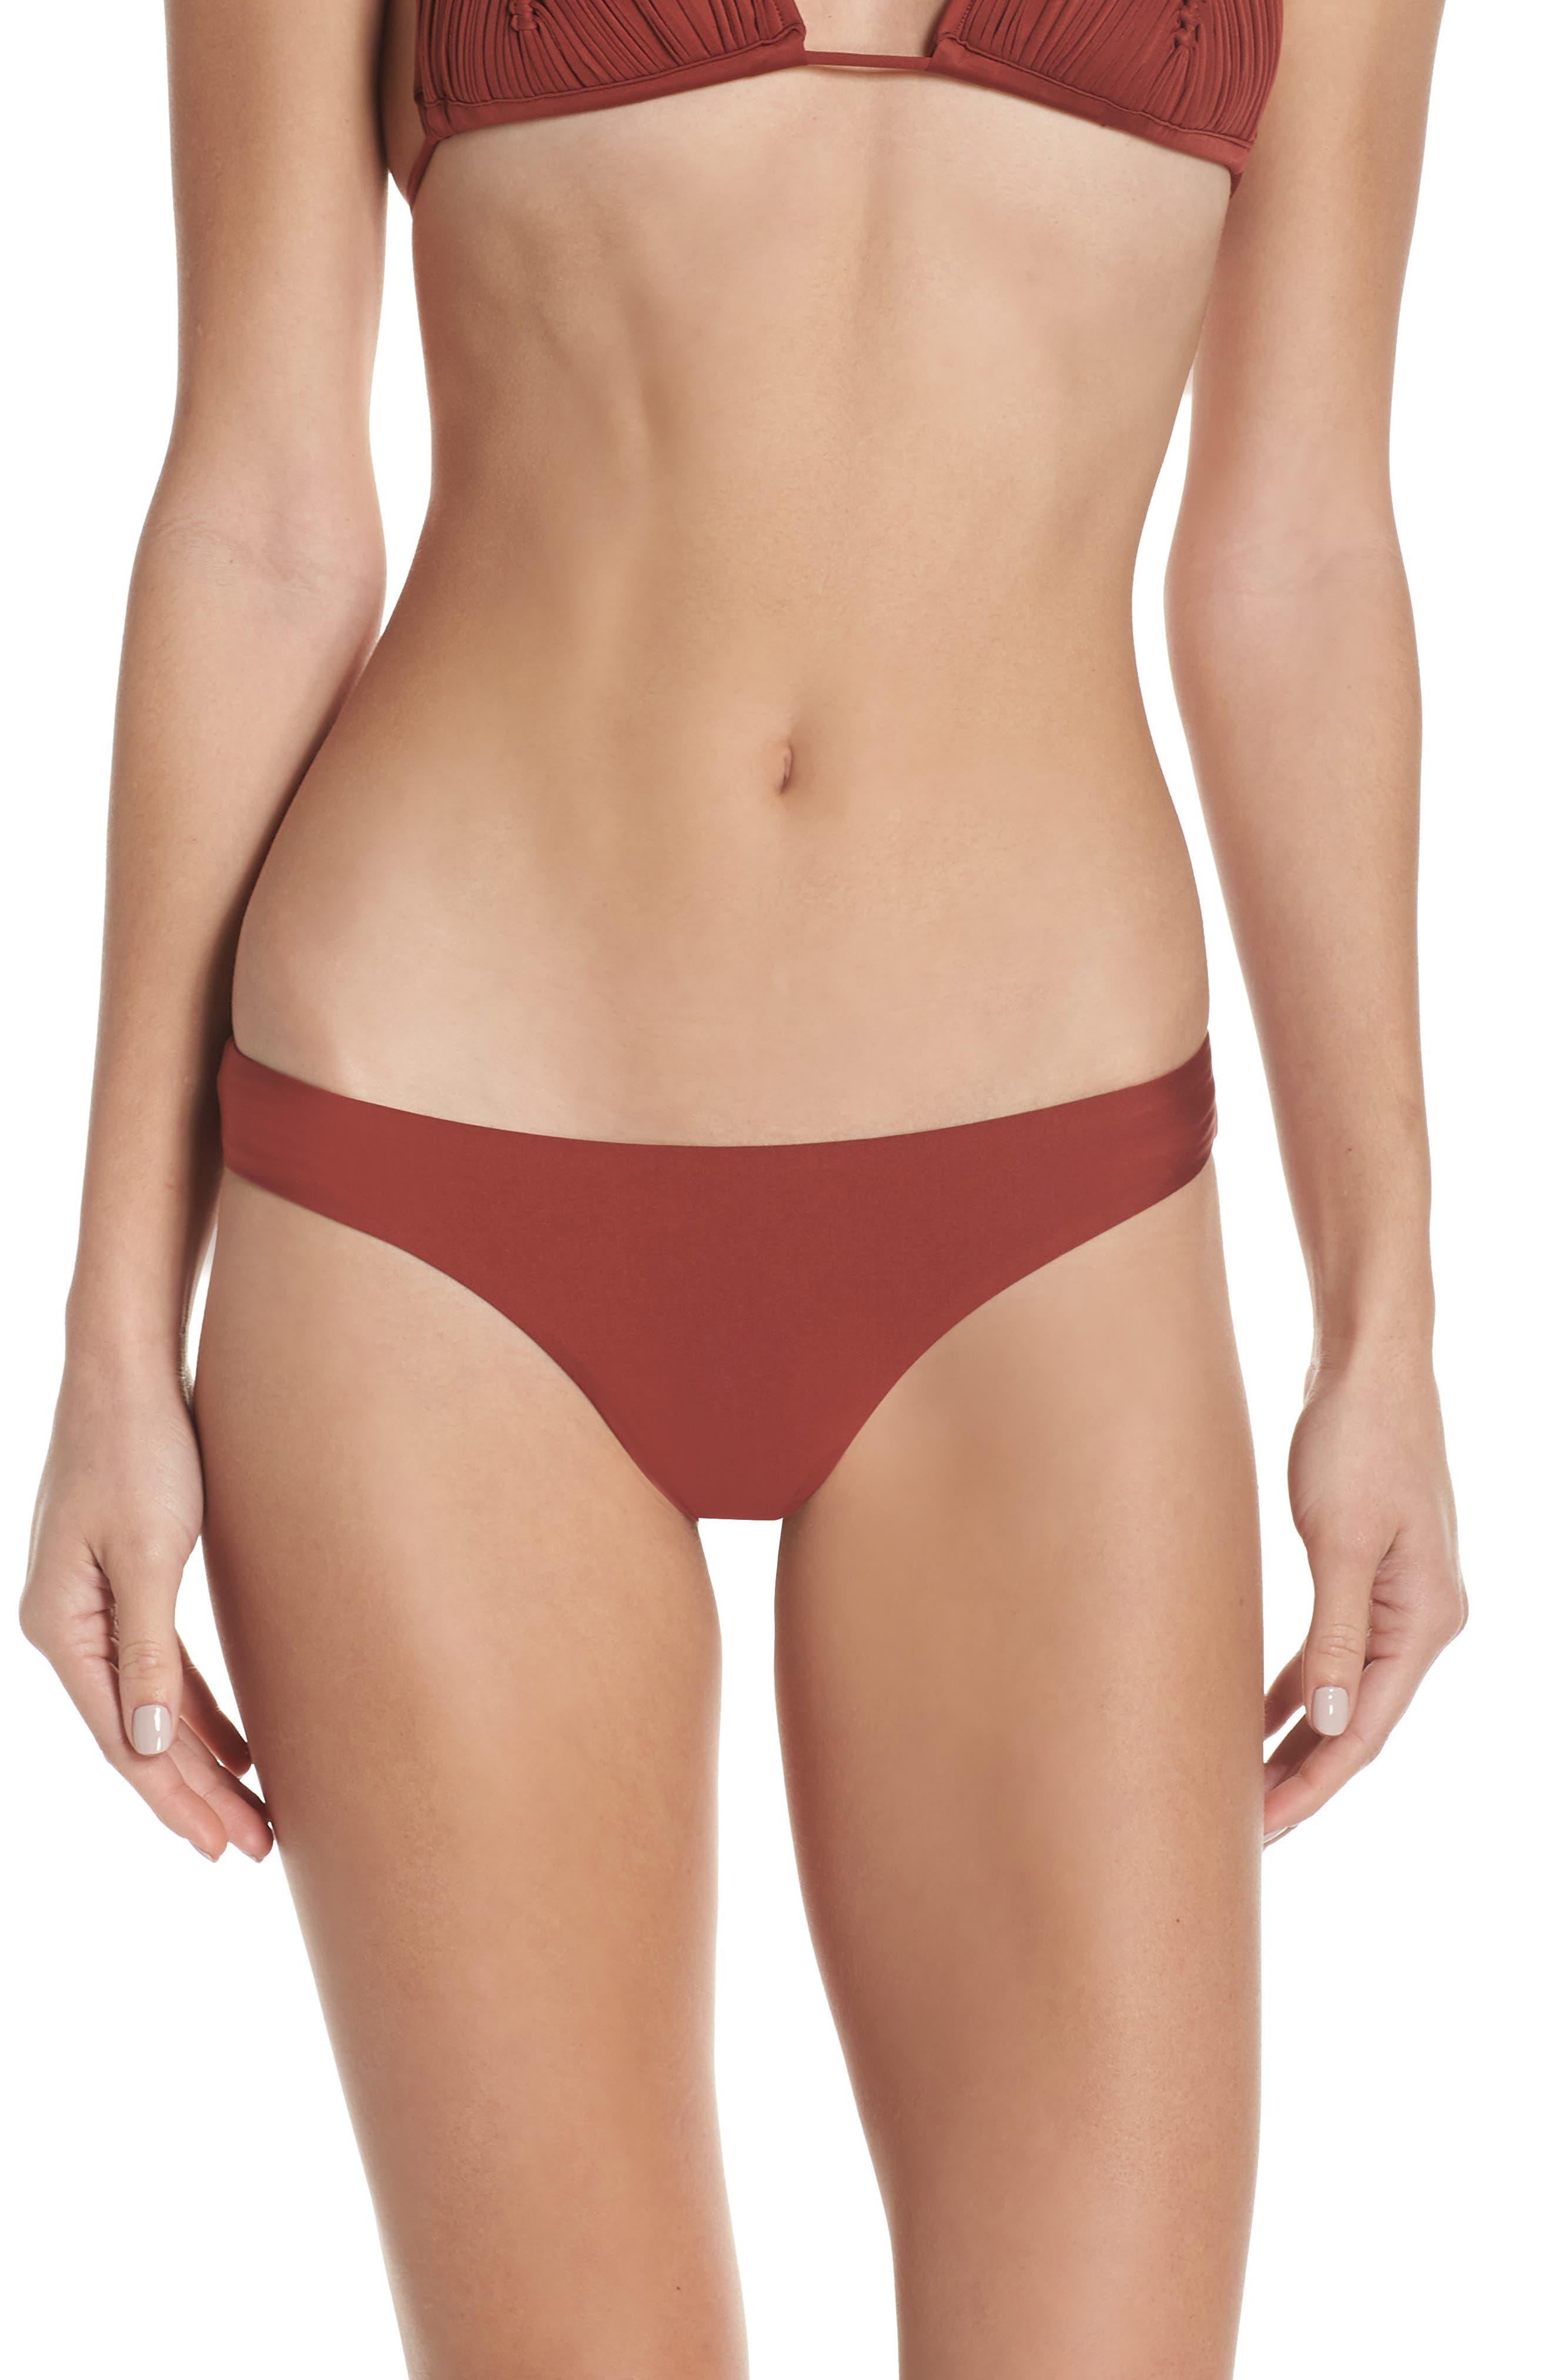 Pilyq Ruched Bikini Bottoms, Orange